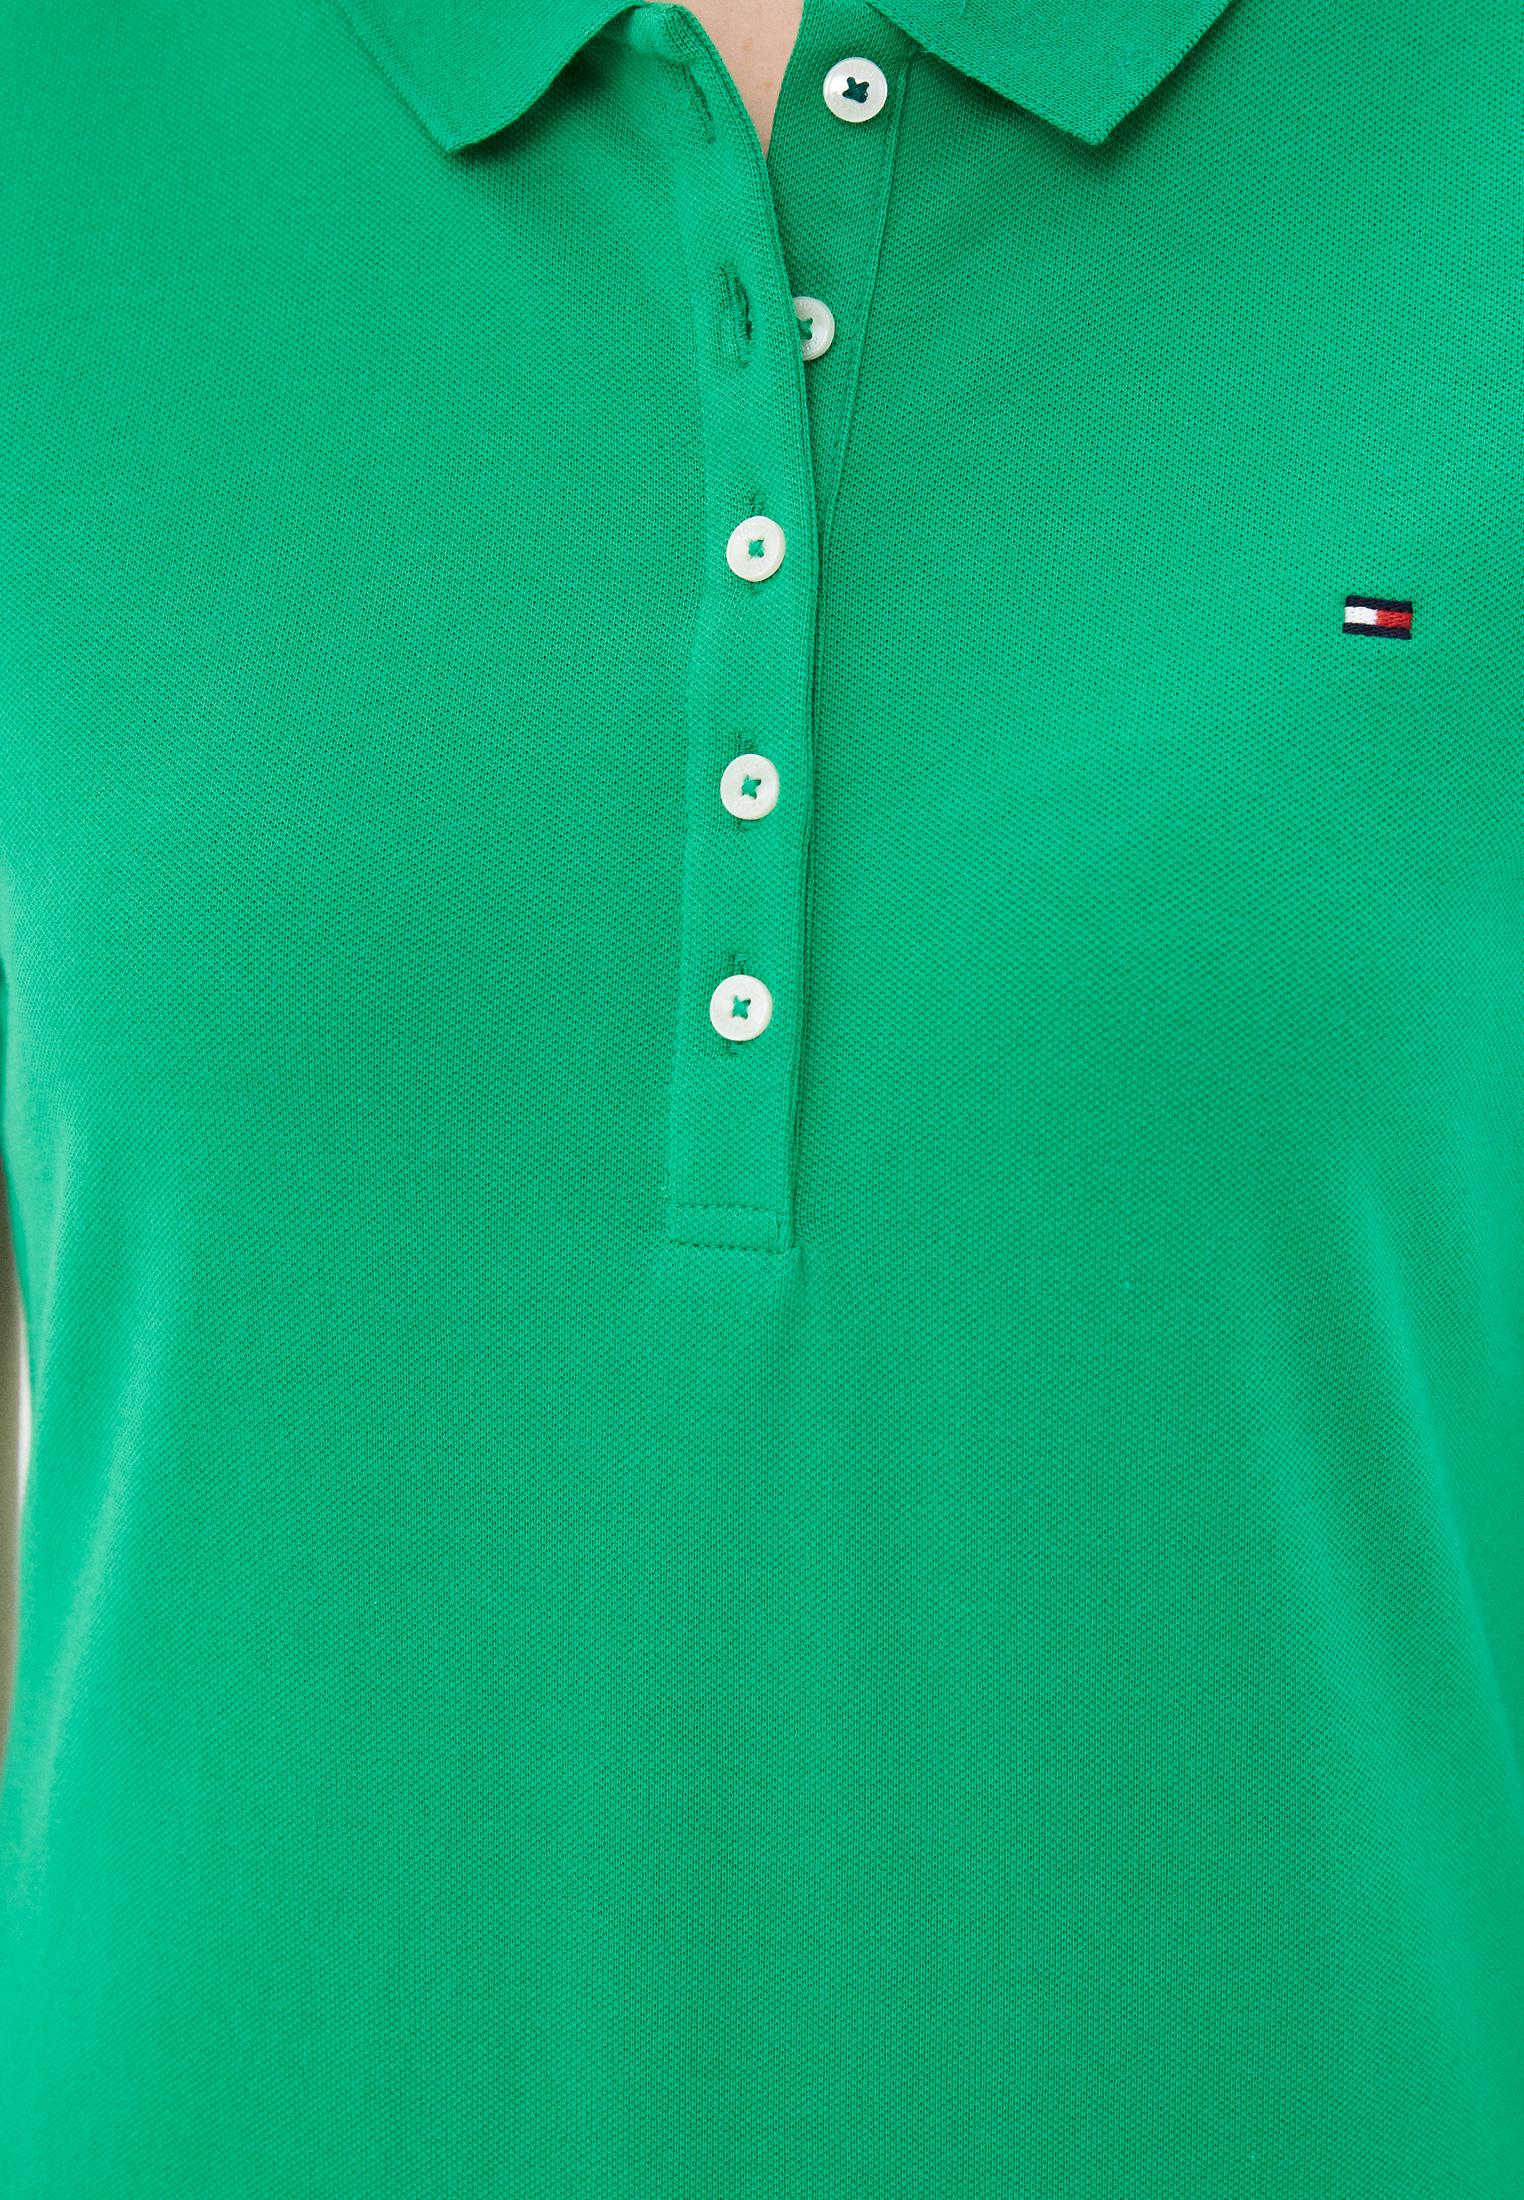 Платье Tommy Hilfiger (Томми Хилфигер) WW0WW27949: изображение 4